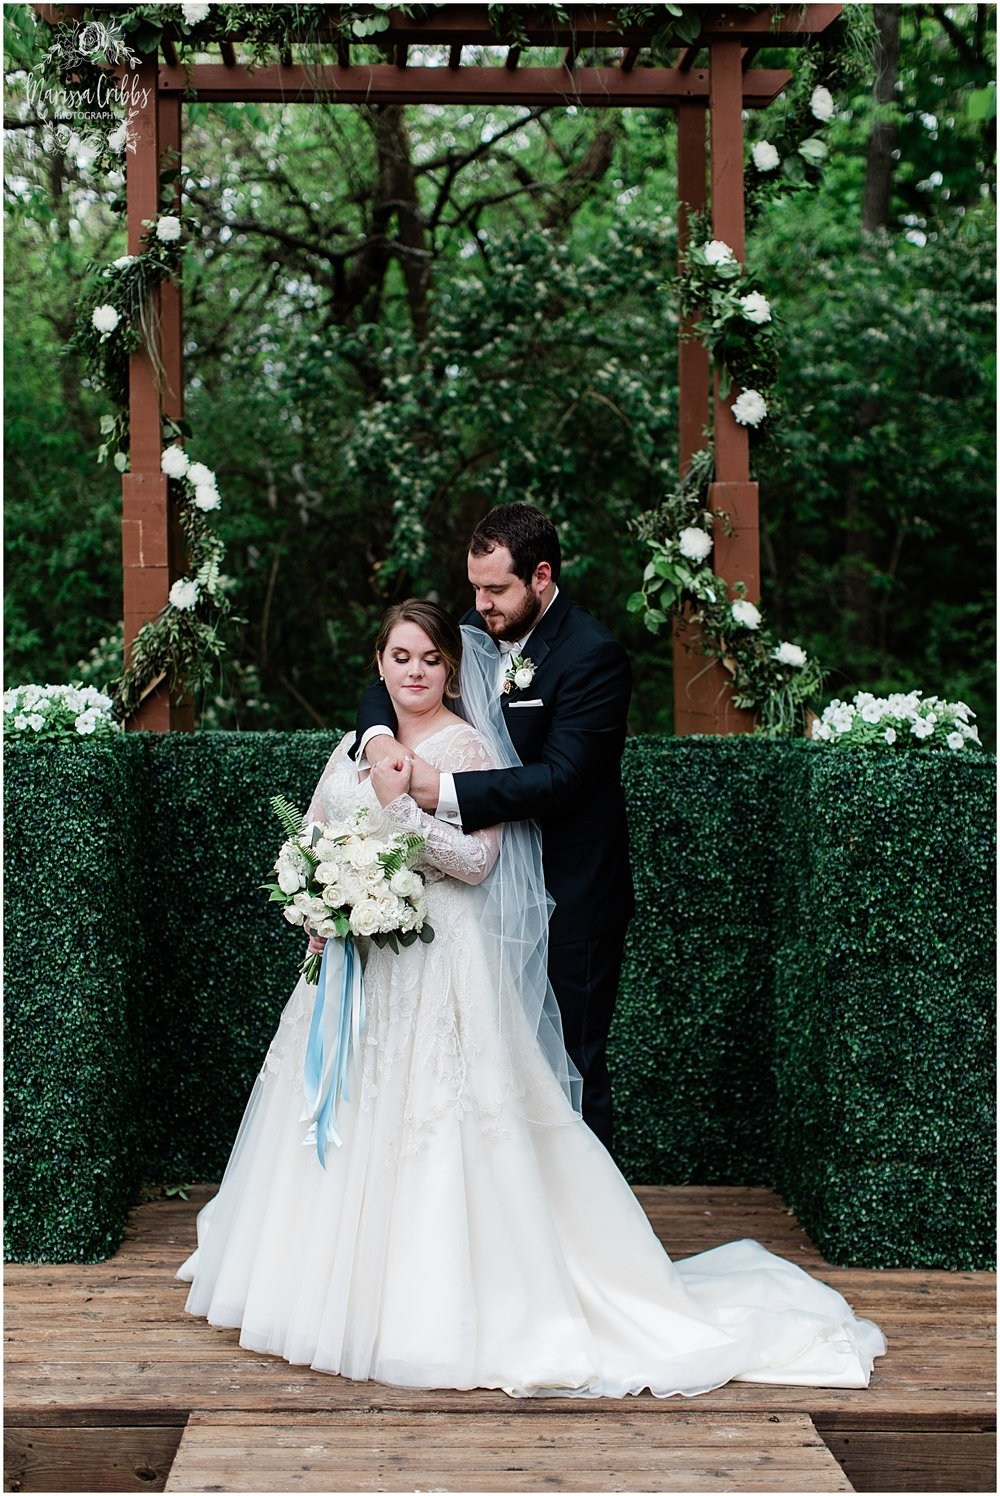 GORBY WEDDING | MARISSA CRIBBS PHOTOGRAPHY_5022.jpg